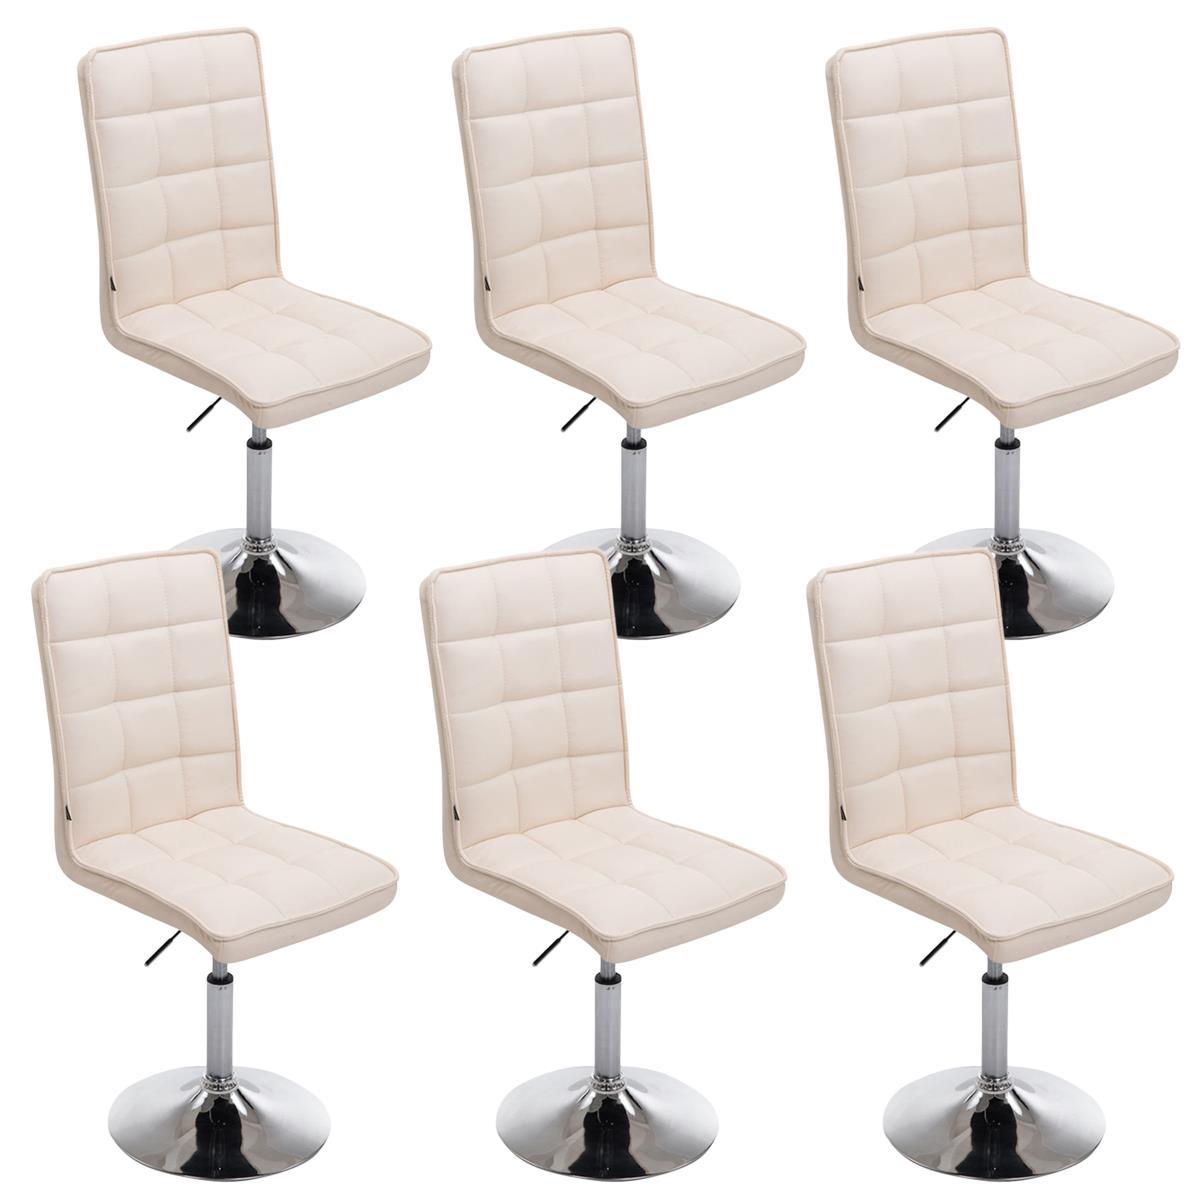 Conjunto de 6 sillas de comedor o cocina osuna piel en for Sillas de comedor de piel